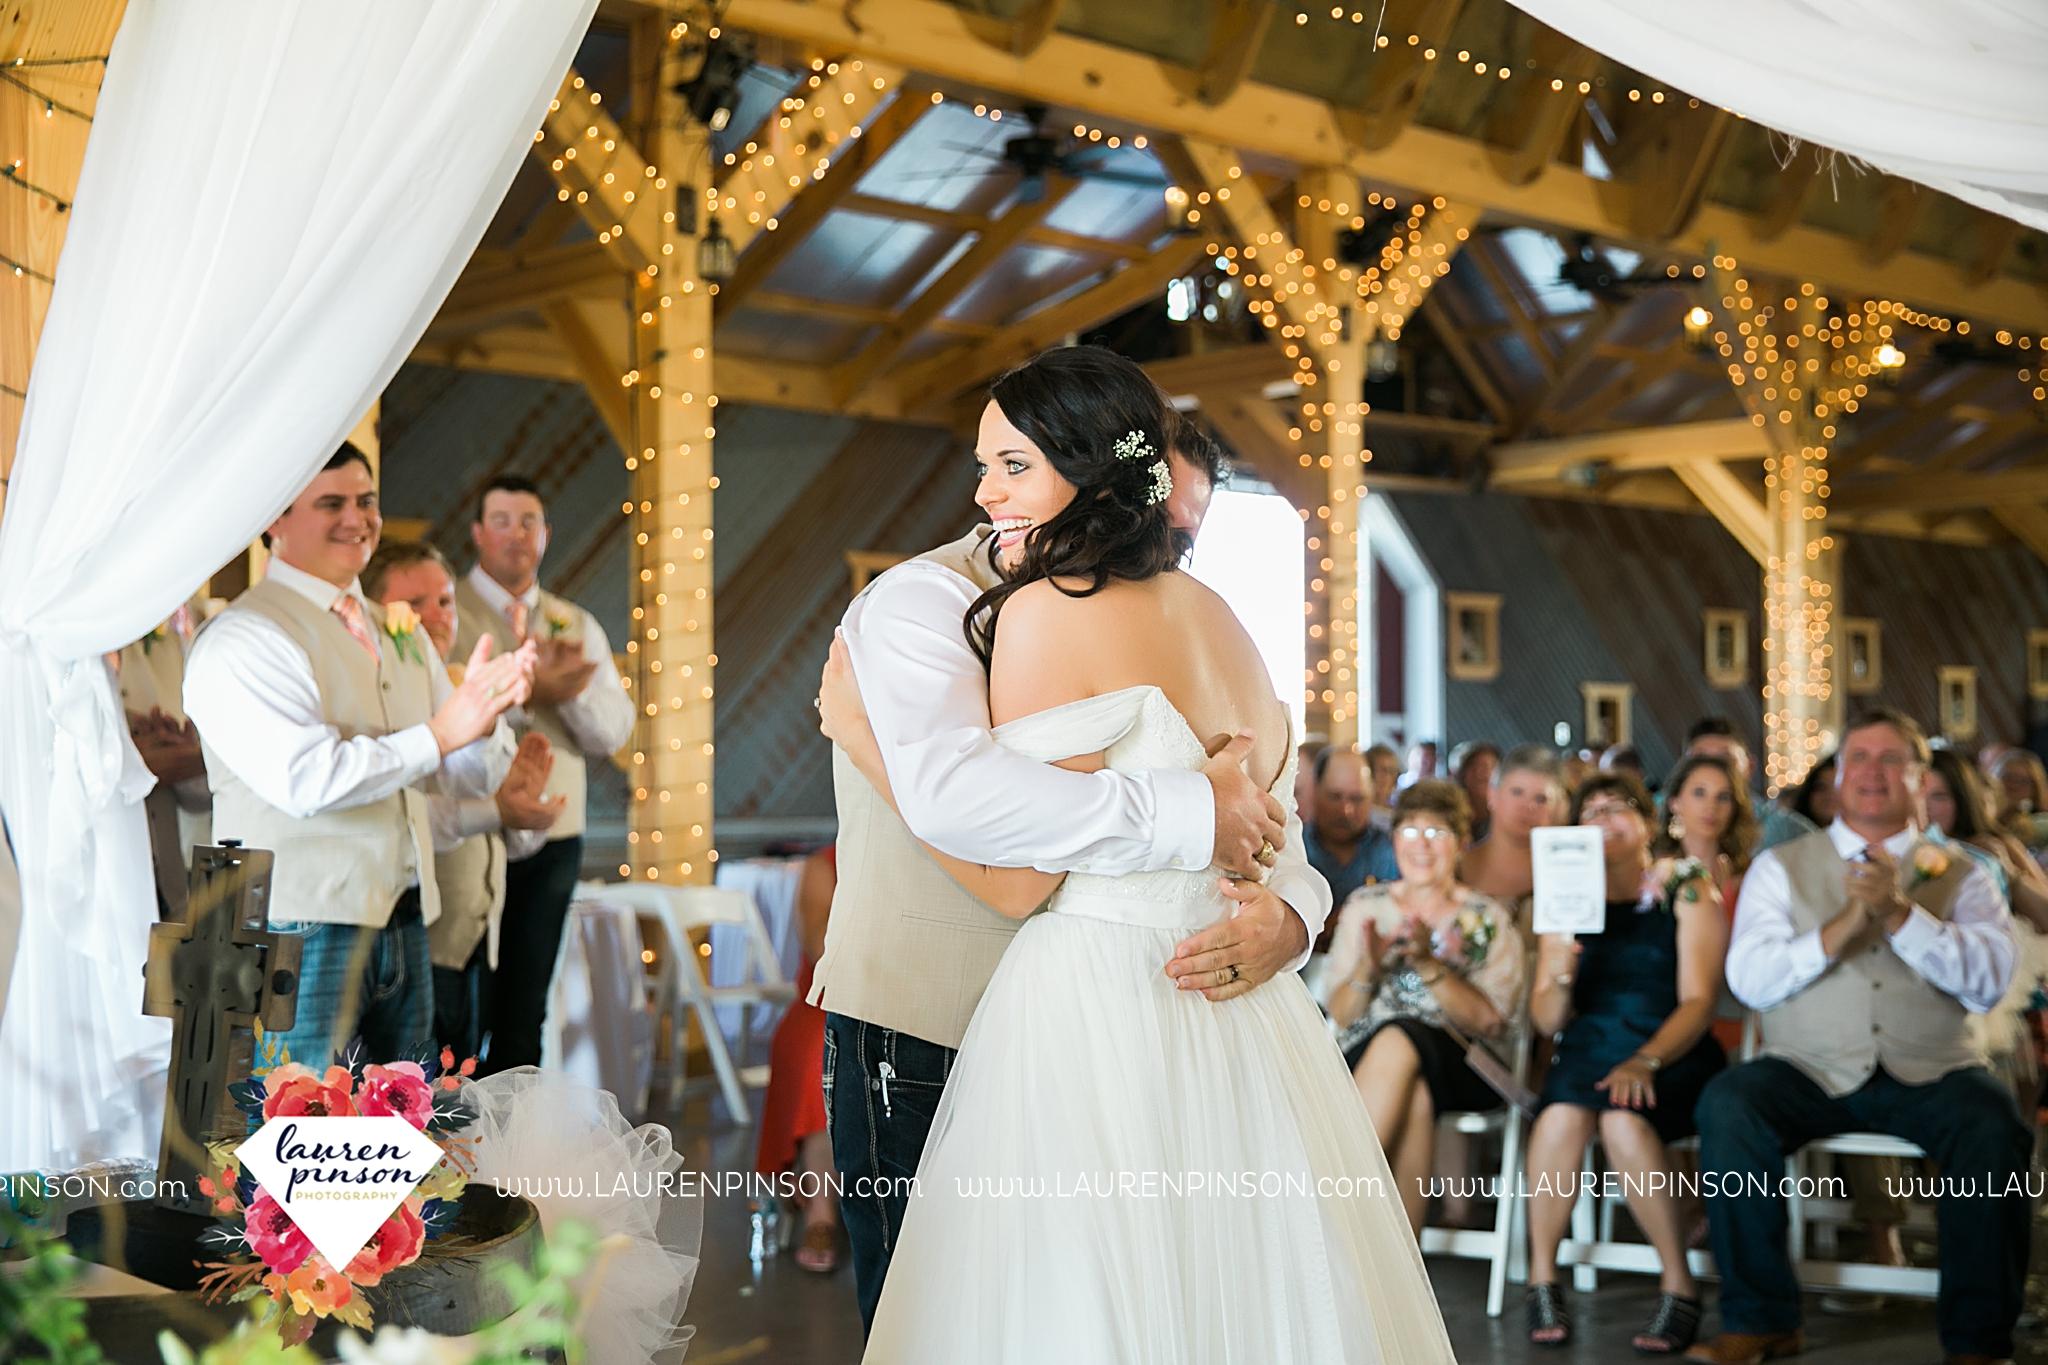 jones-barn-willow-creek-ranch-wedding-in-cleburne-texas-fort-worth-dfw-wichita-falls-wedding-photography_3250.jpg